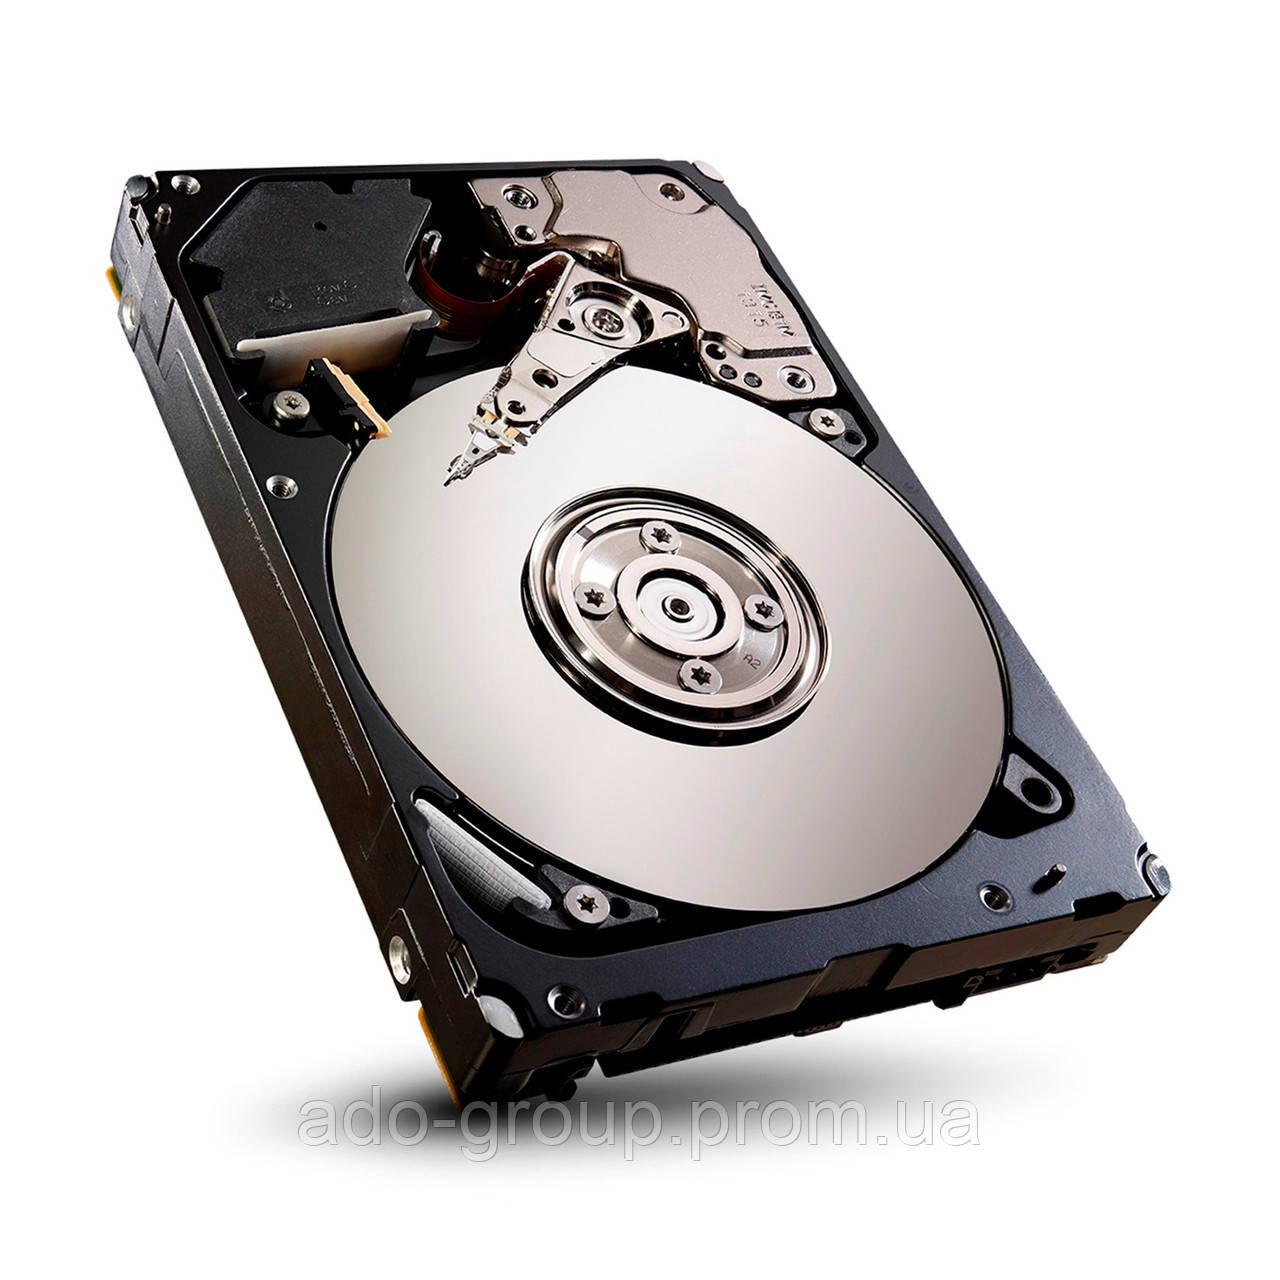 "FC959 Жесткий диск Dell 73GB SCSI 10K U320 3.5"" +"